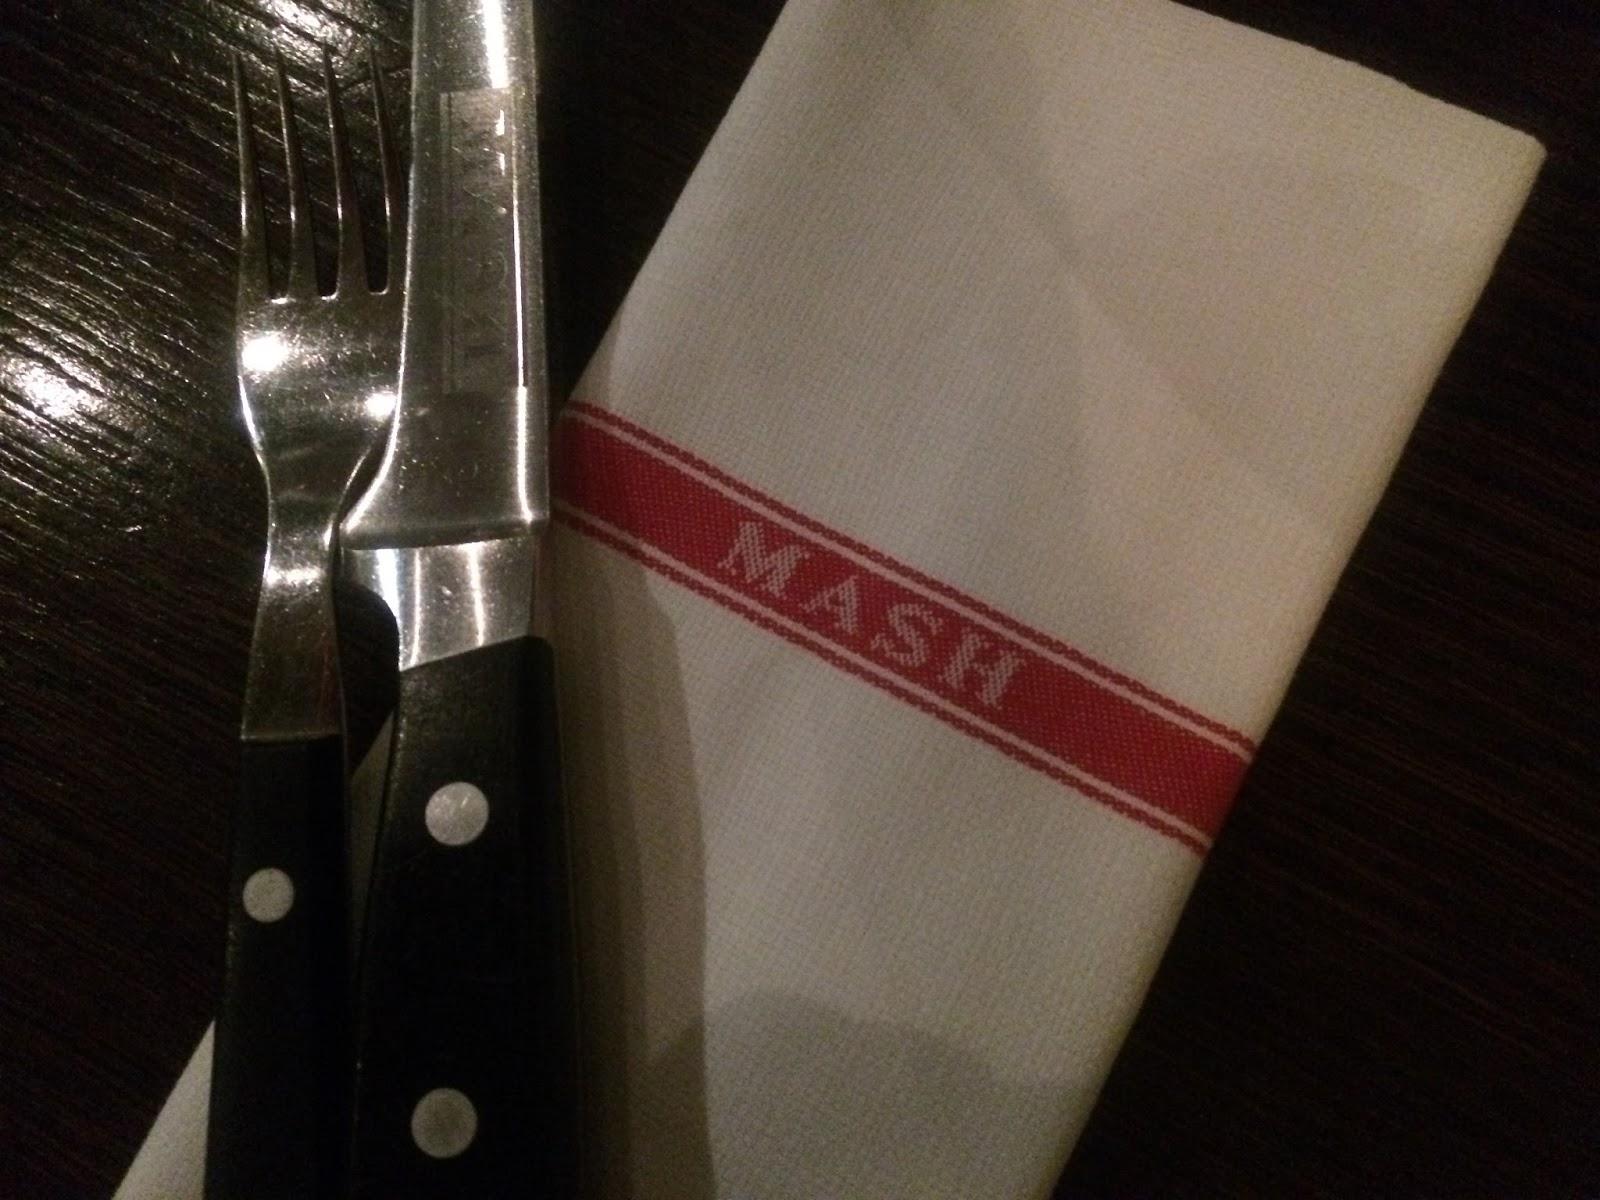 Copenhagen Travel Post - MASH Steak Restaurant Review